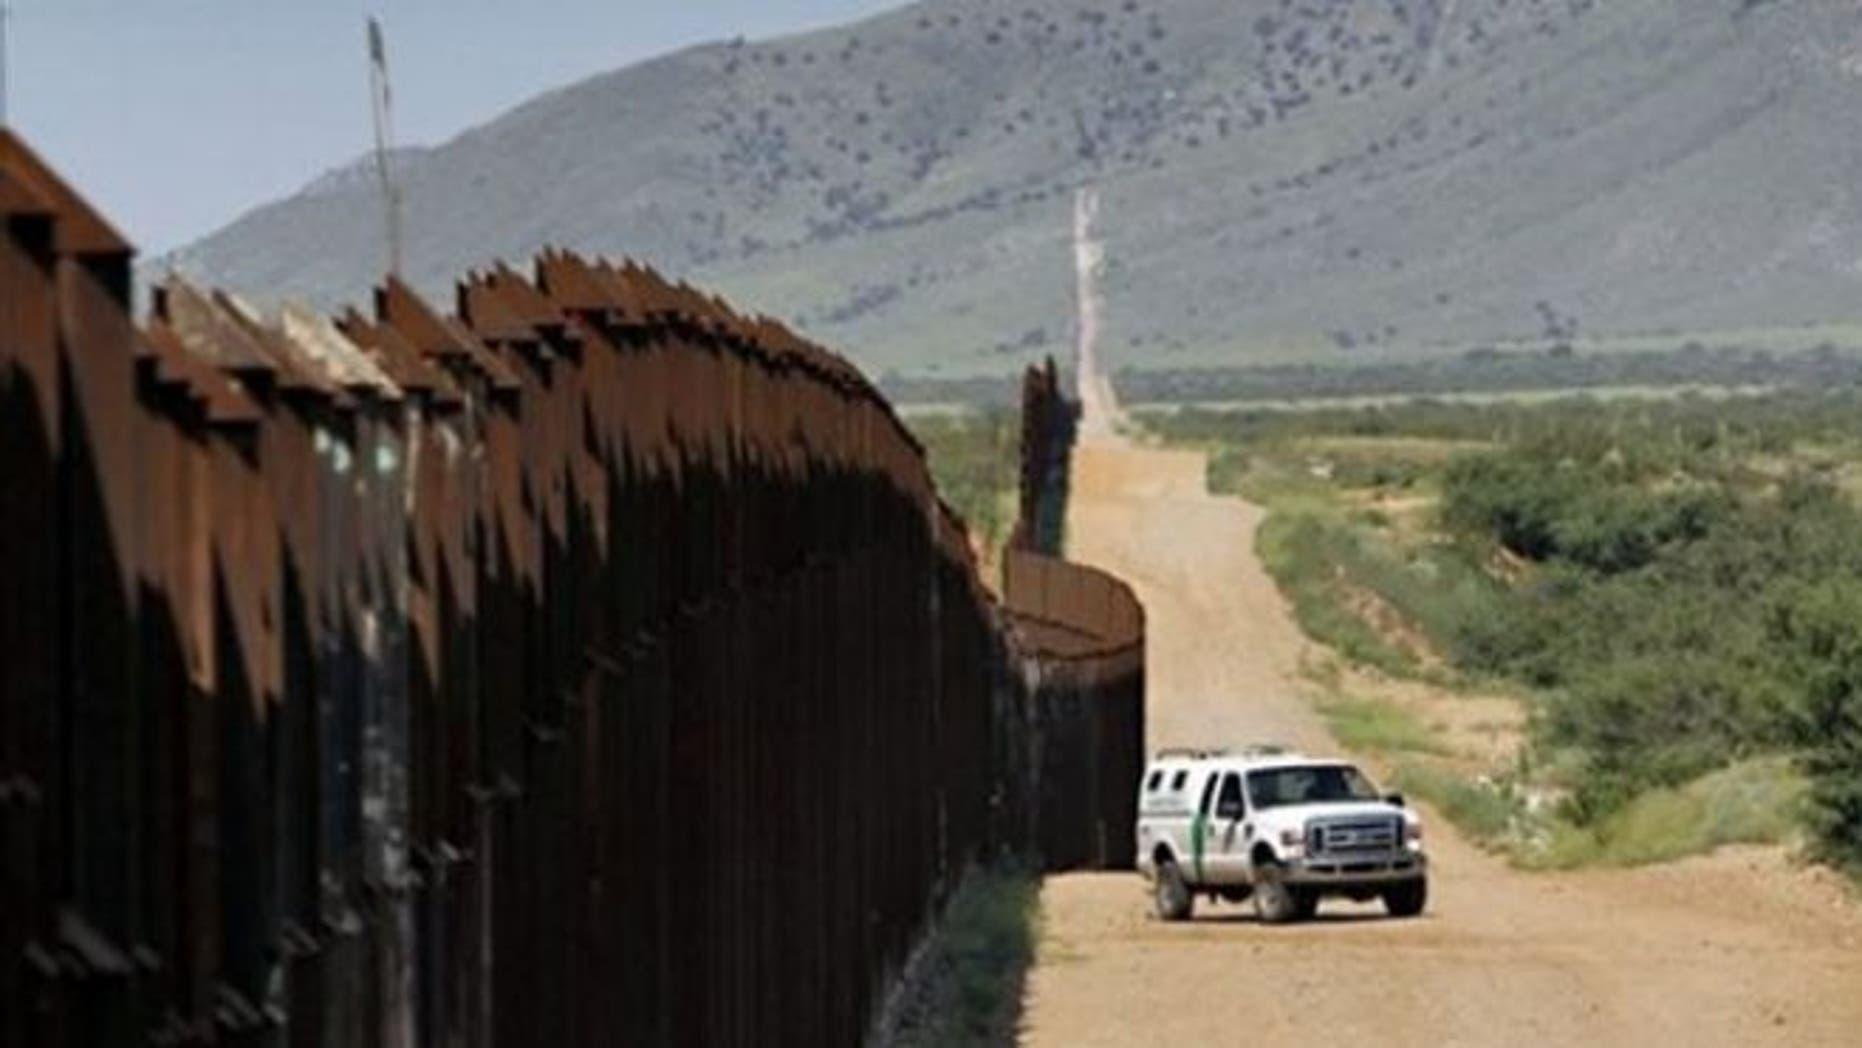 Aug. 15, 2010: A U.S. Customs and Border Patrol agent patrols along the Arizona-Mexico border in Hereford, Ariz.